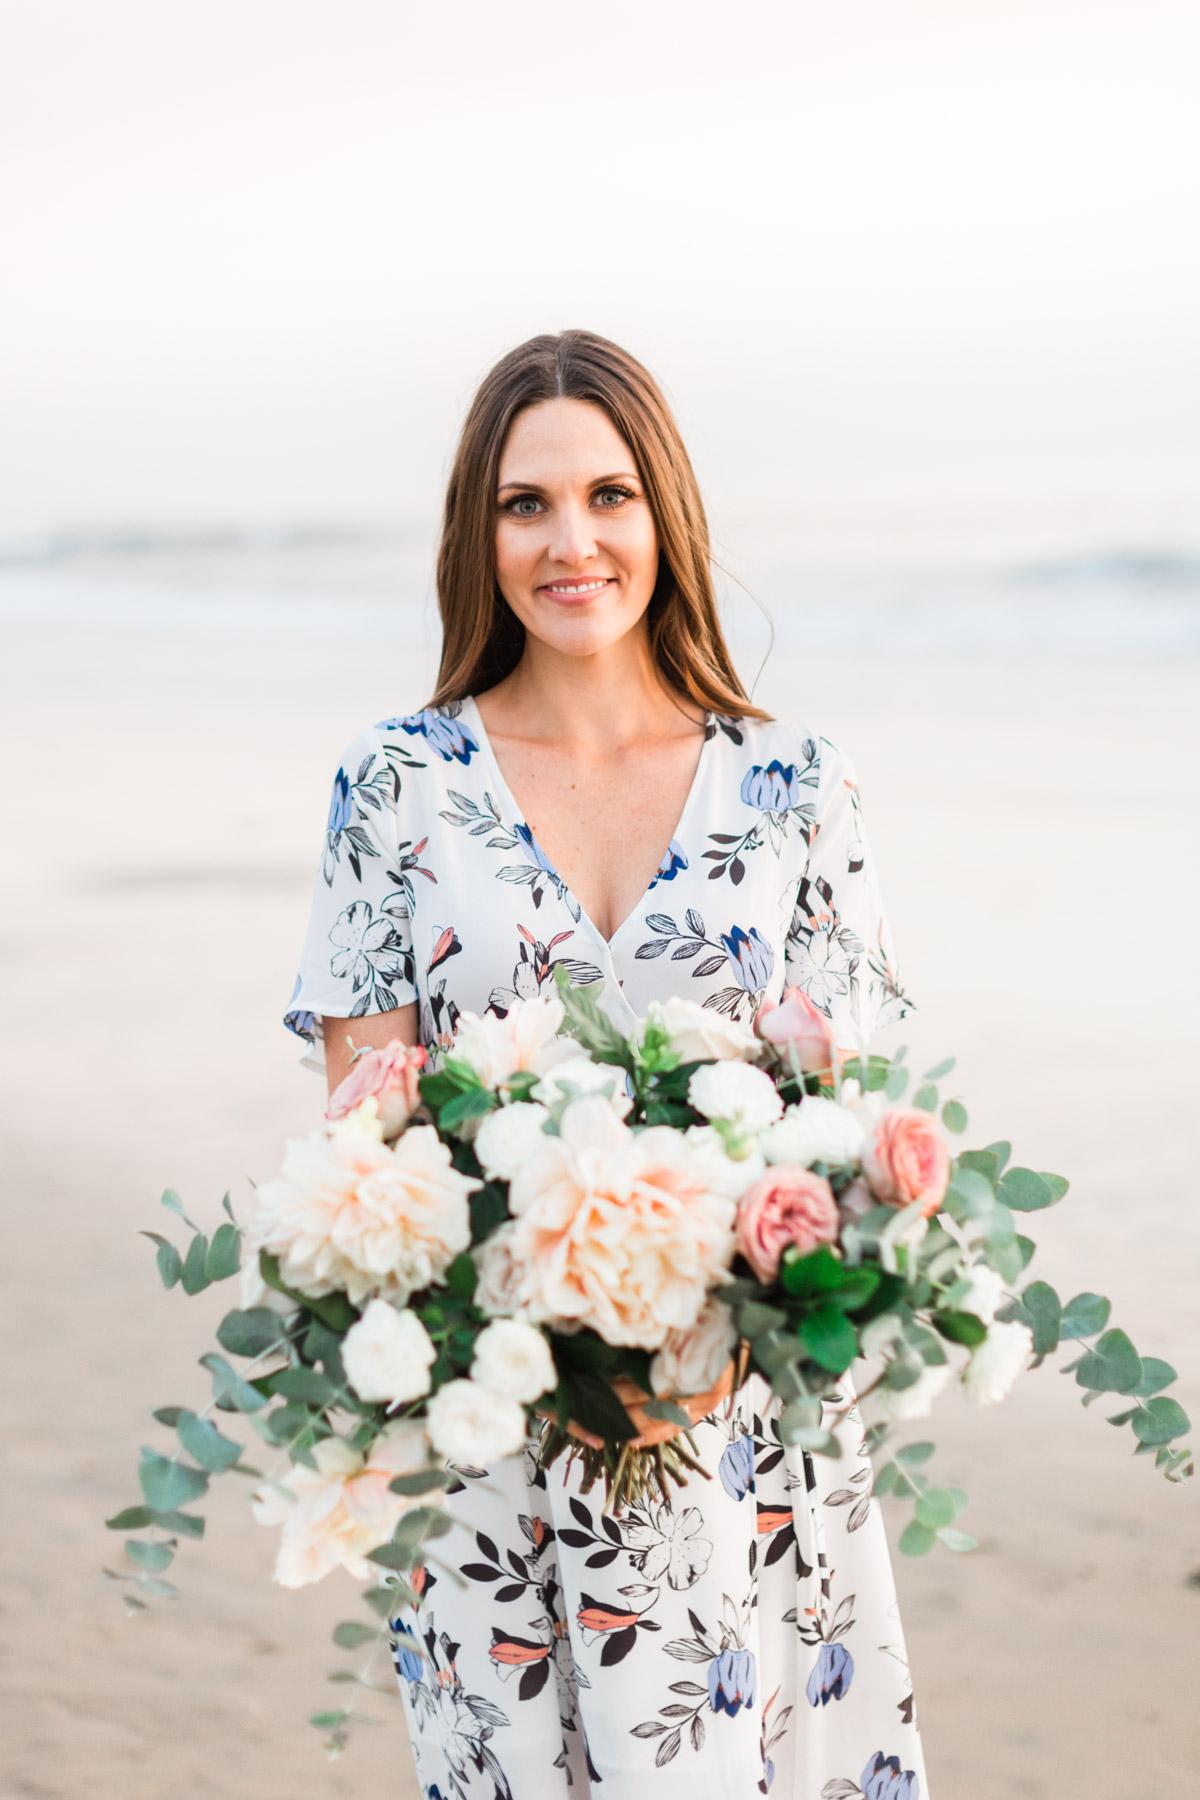 Romantic beach bridal bouquet of dahlias, roses and eucalyptus | Newport Beach, CA | Compass Floral | Wedding Florist in San Diego and Southern California | Cavin Elizabeth Photography